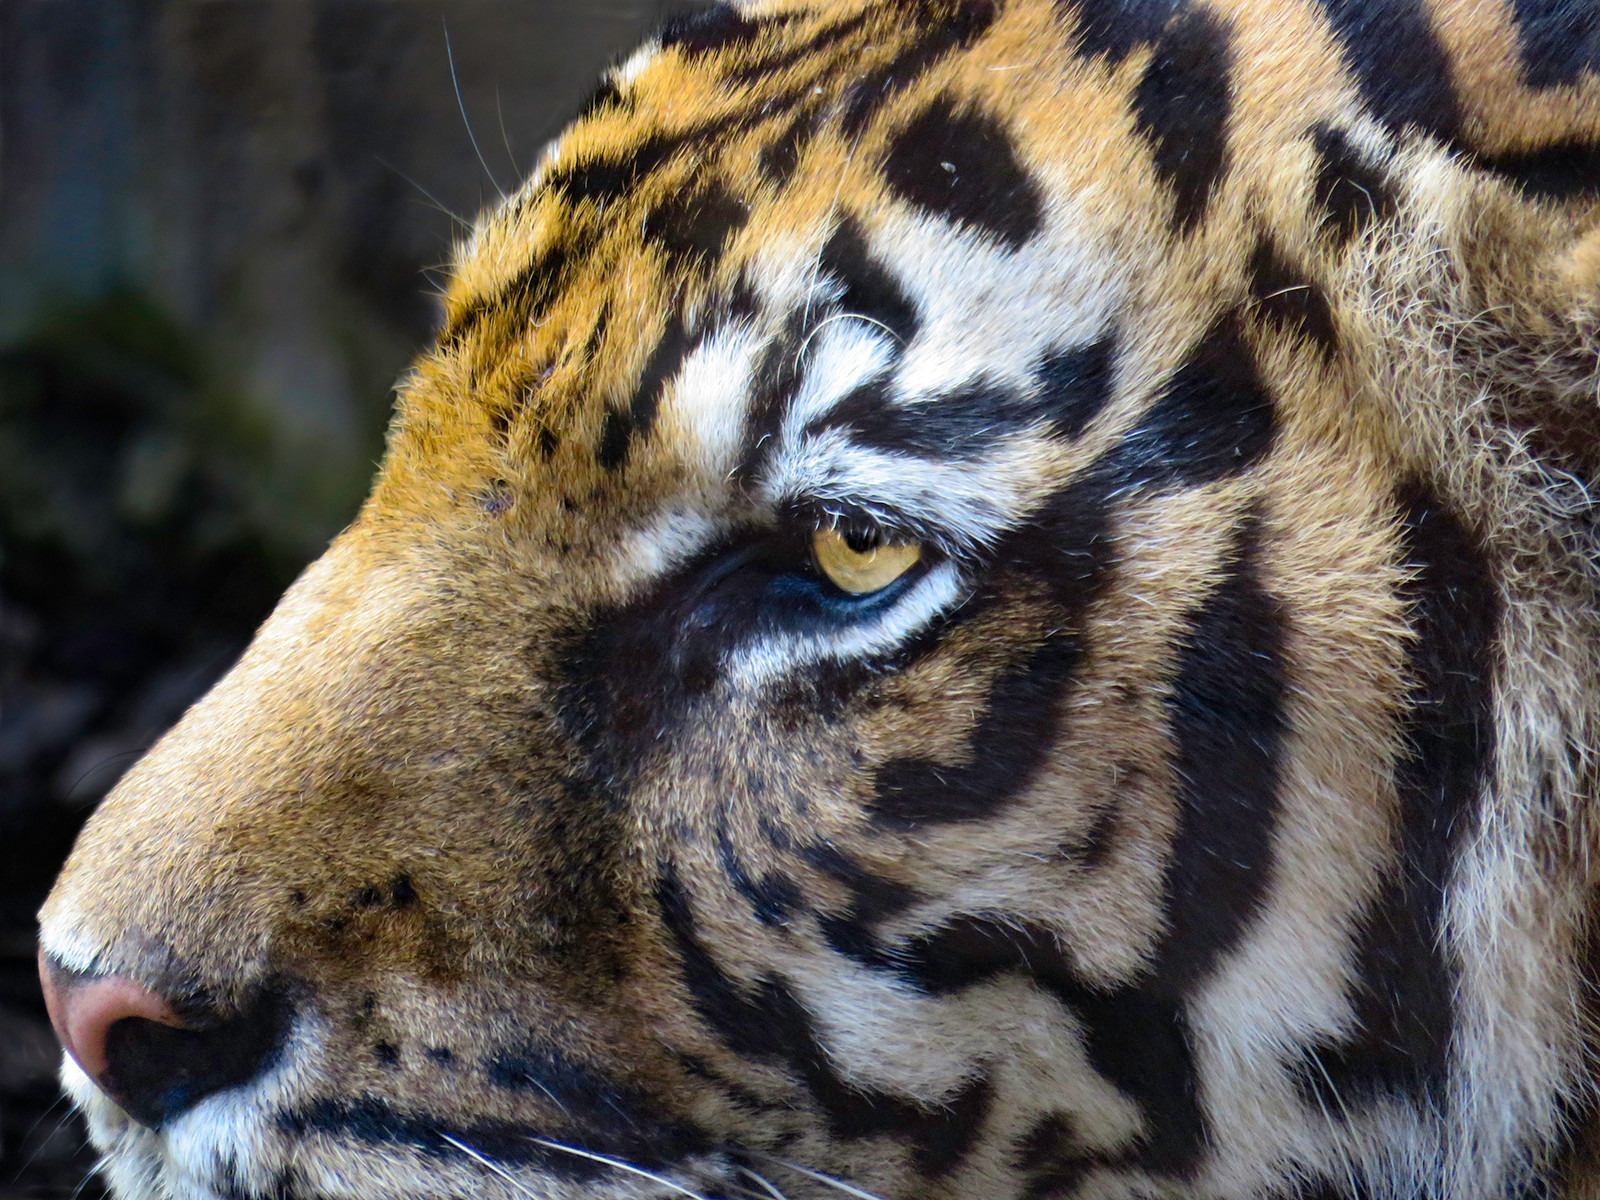 PDI - Eye of the Tiger - Survivor by Jennifer James (12 marks)